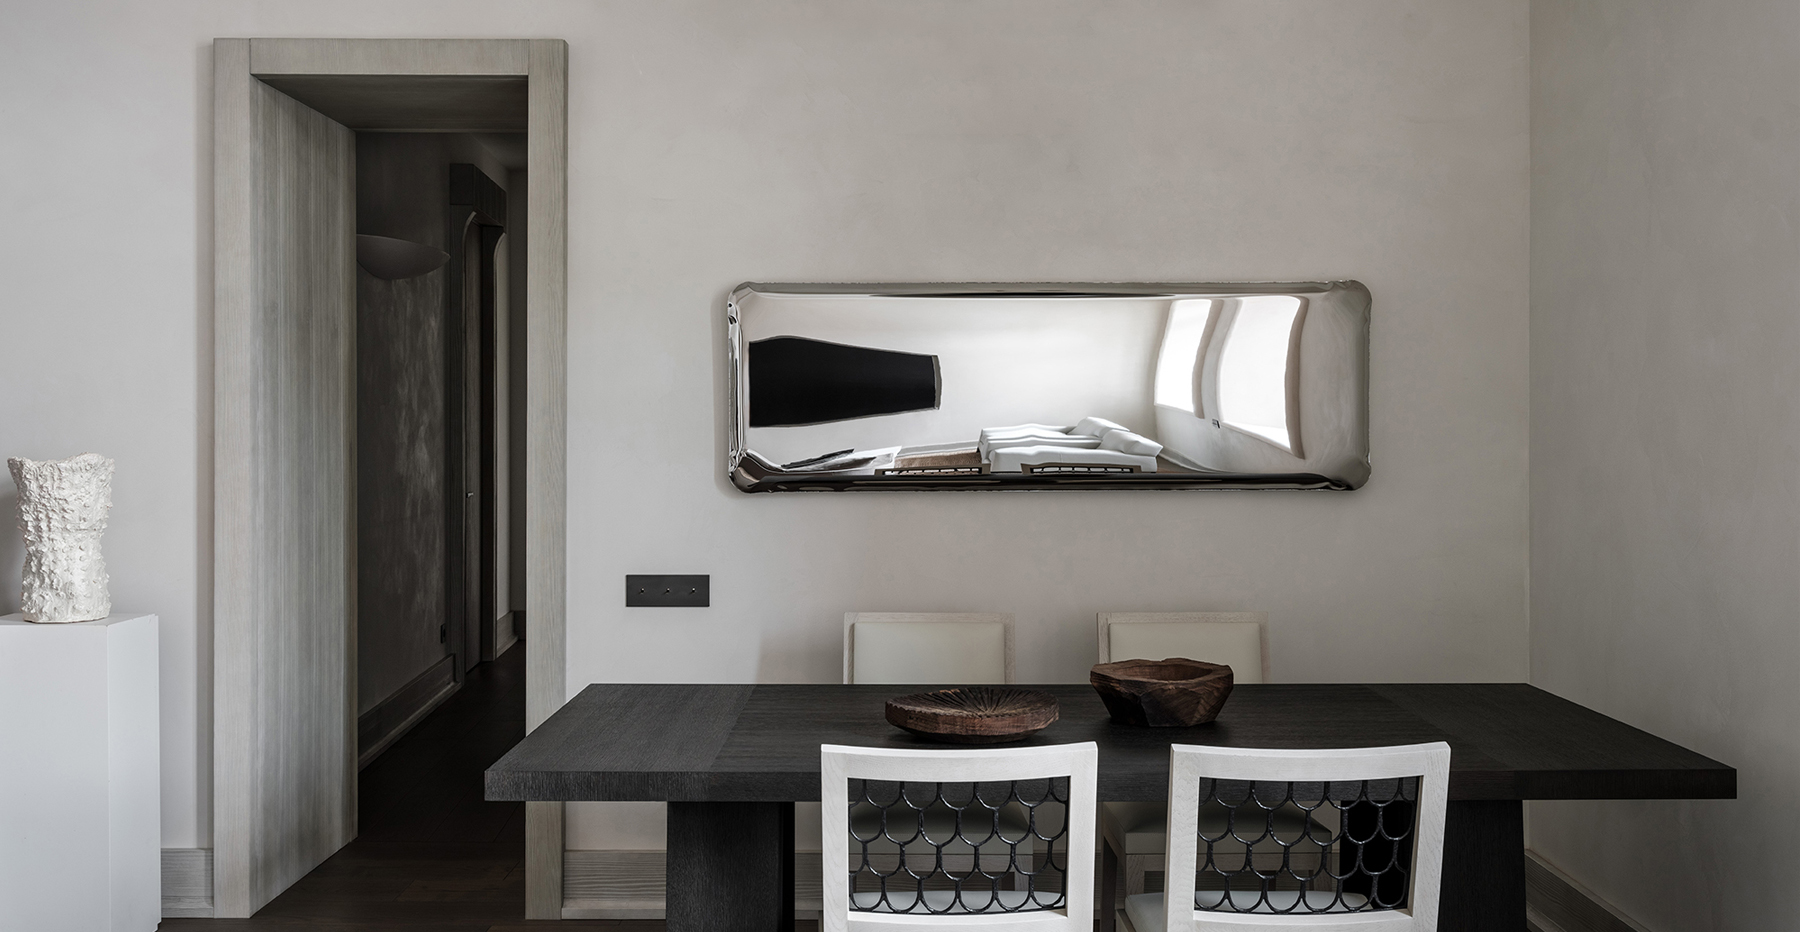 Mirrors by Zieta Studio